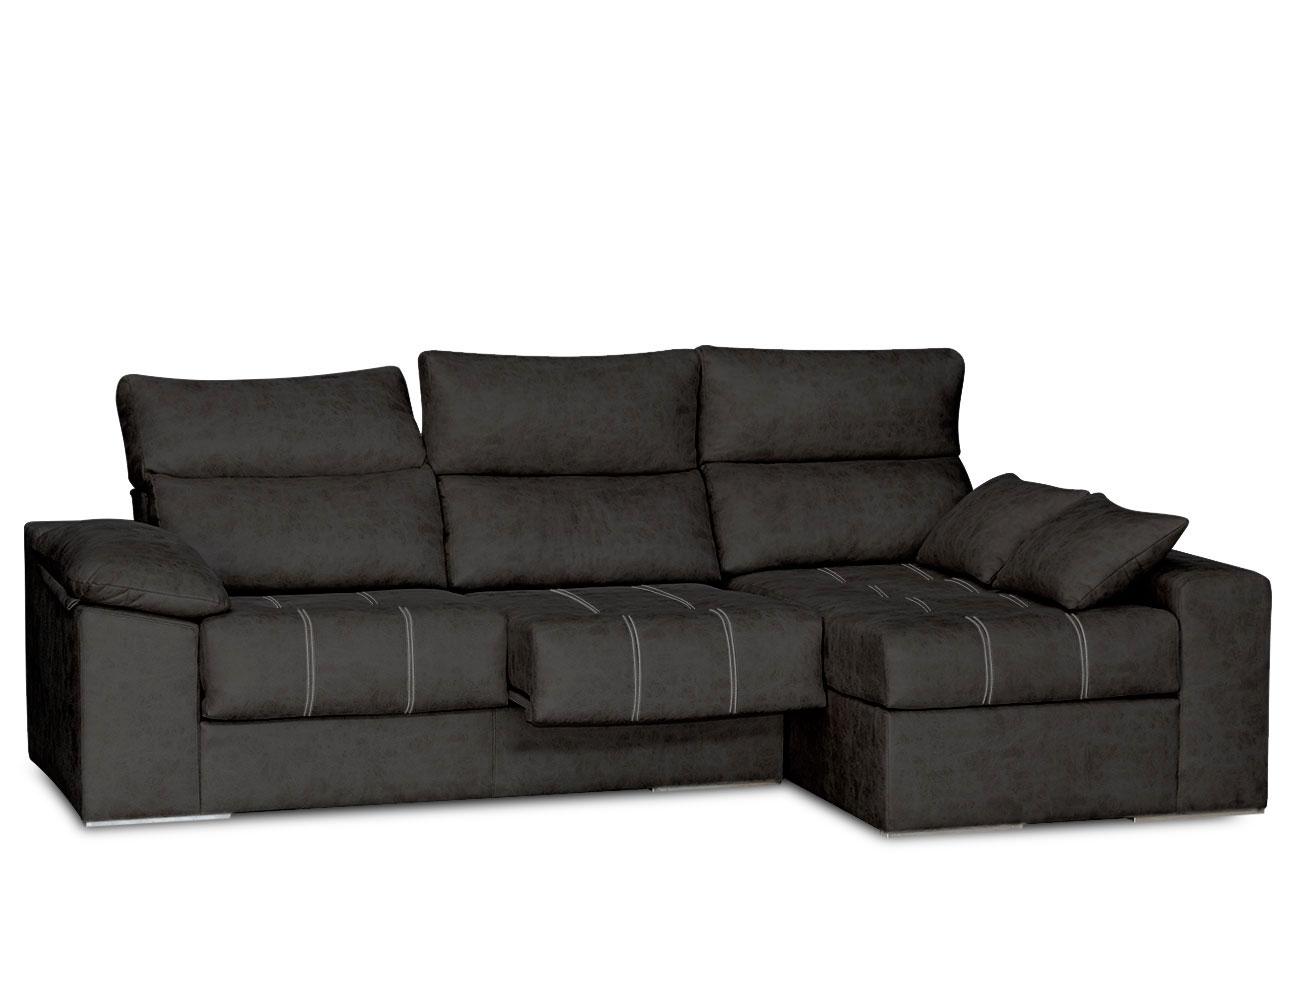 Sofa chaiselongue surf negro  con pespuntes contrastados